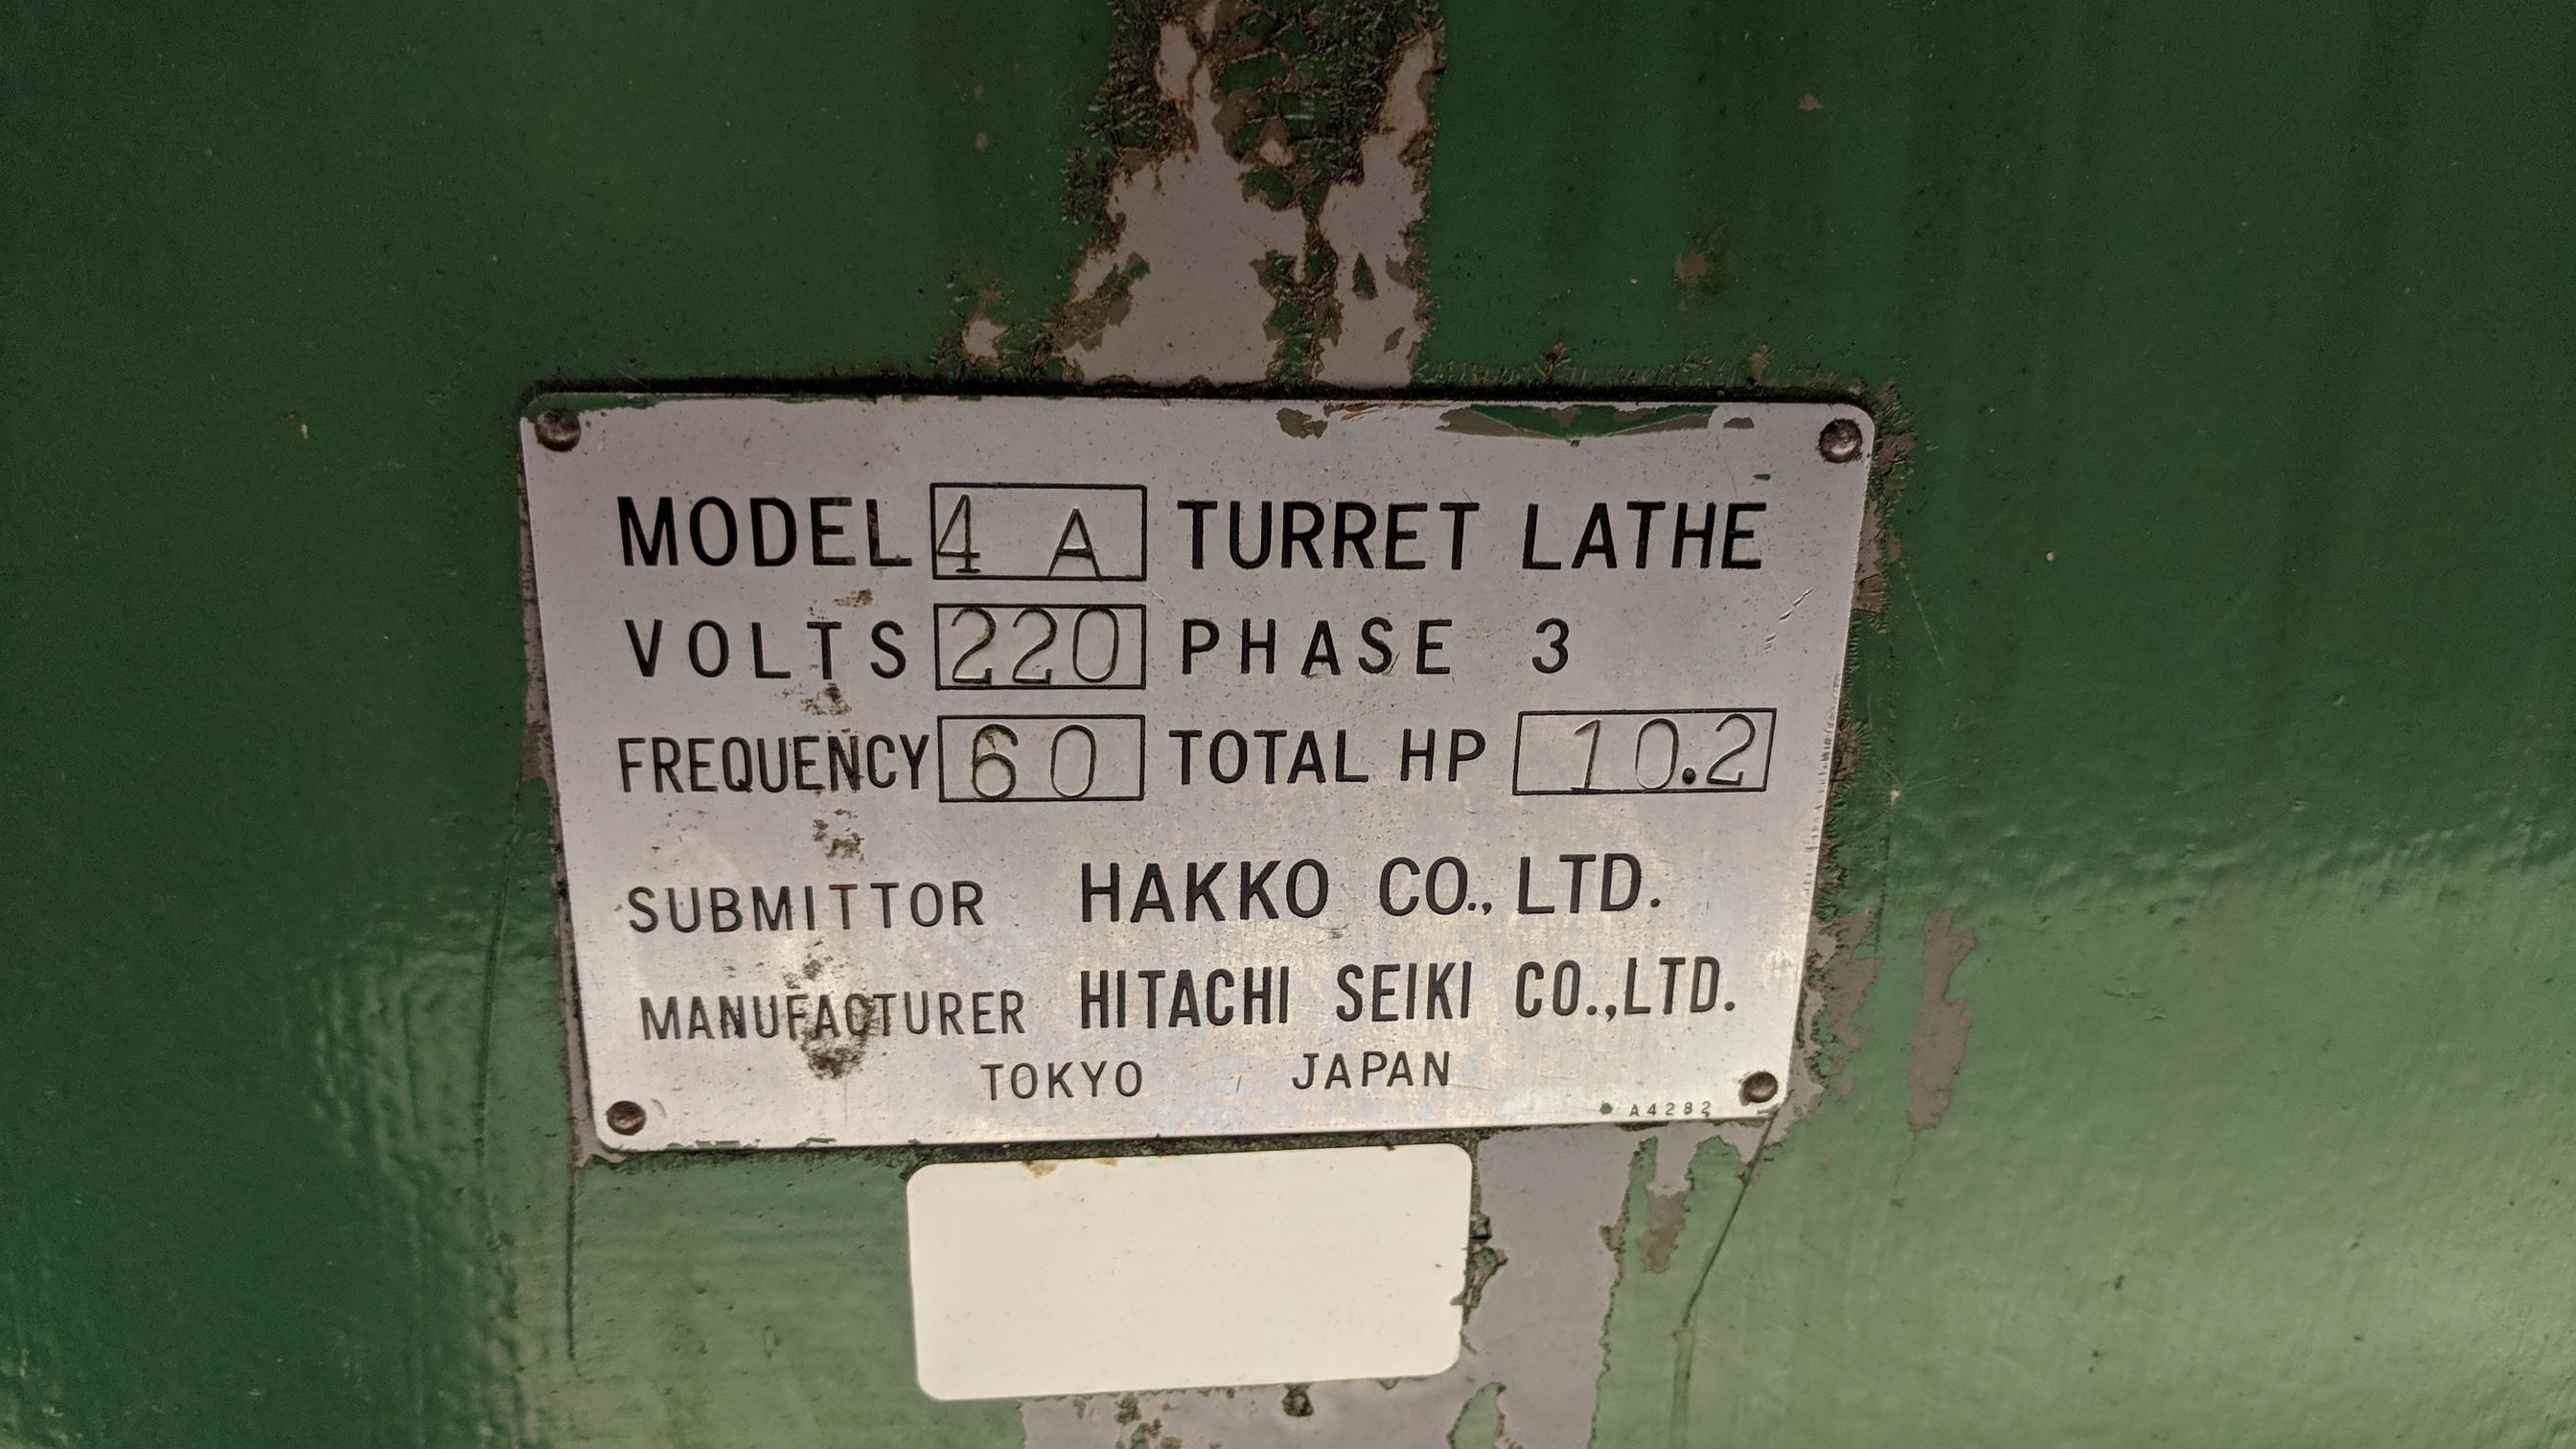 HITACHI SEIKI #4A CONVENTIONAL TURRET LATHE WITH S/N E40391 (CI) - Image 7 of 7